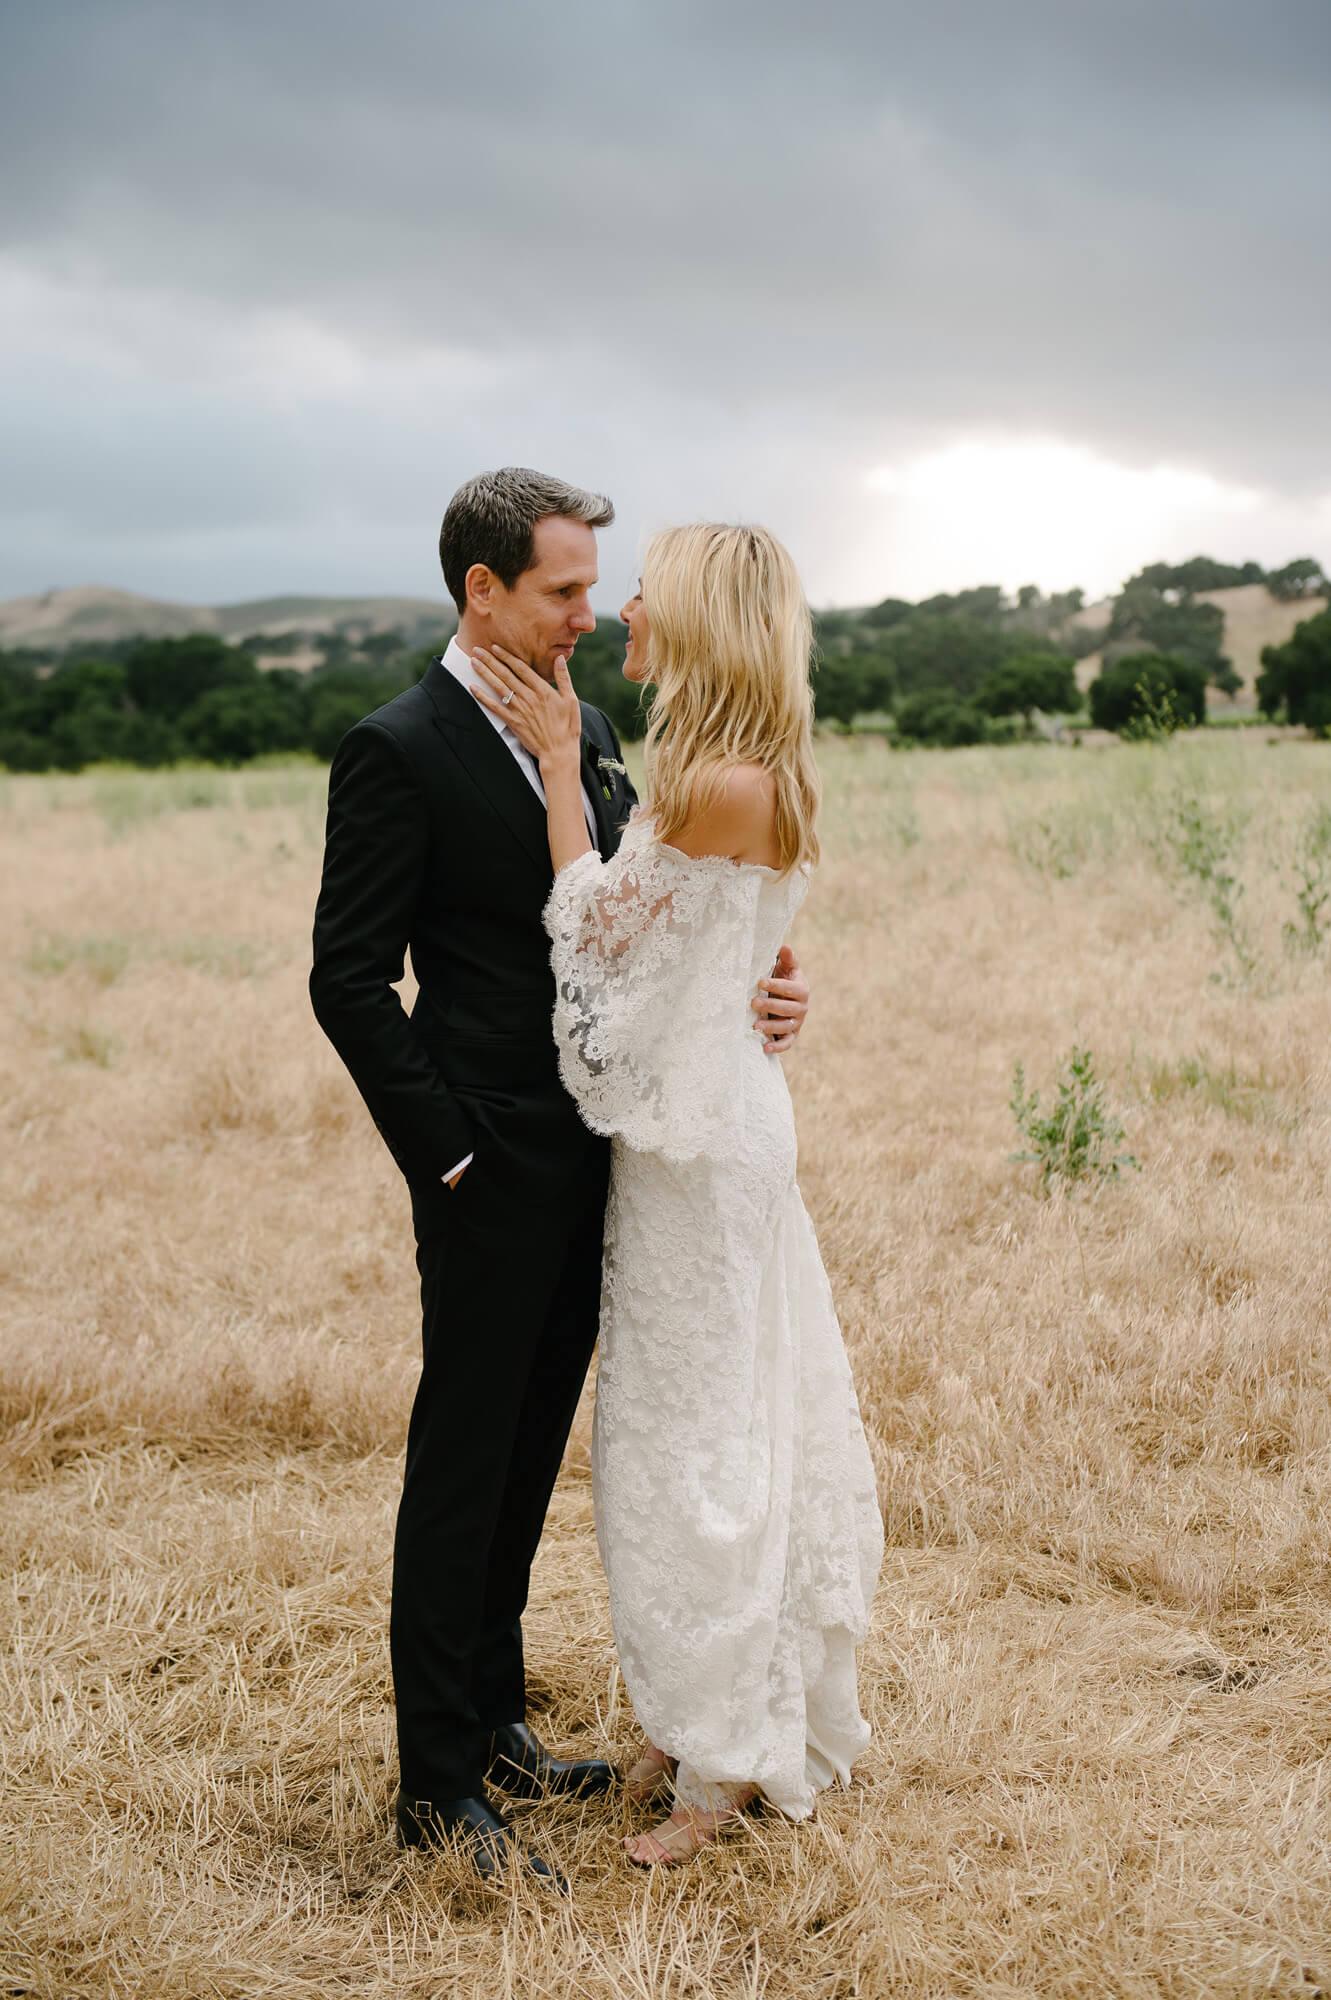 los-olivos-firestone-winery-destination-wedding-central-coast-wedding-photographer-16.jpg